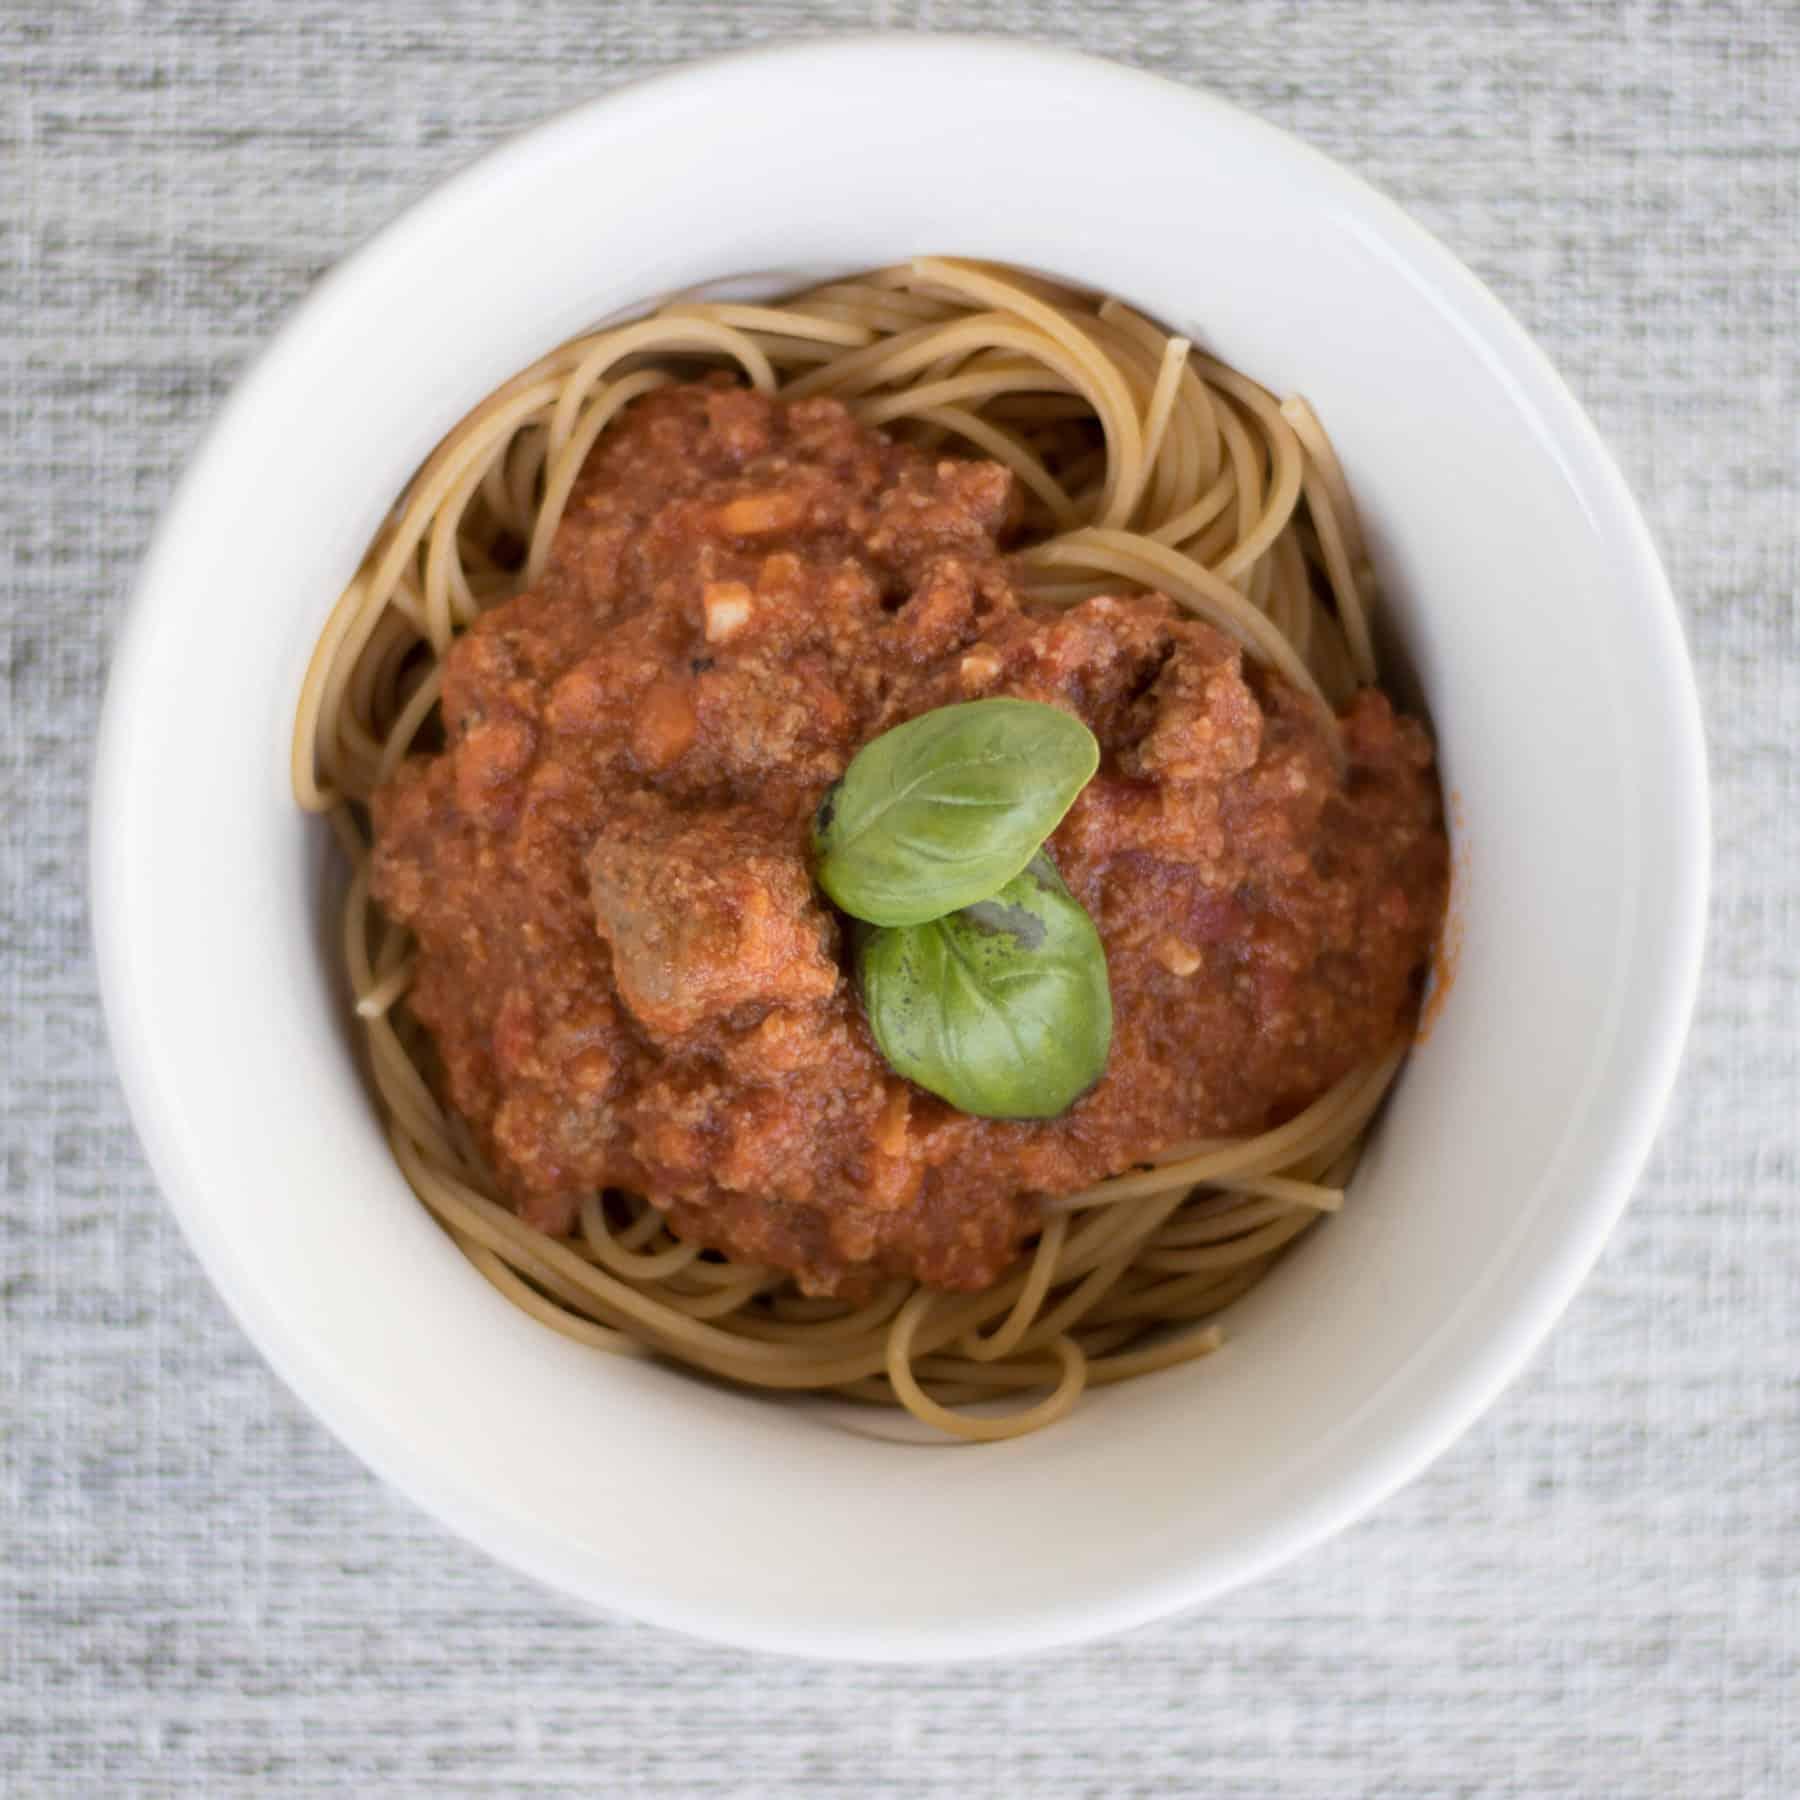 bolognese sauce over spaghetti